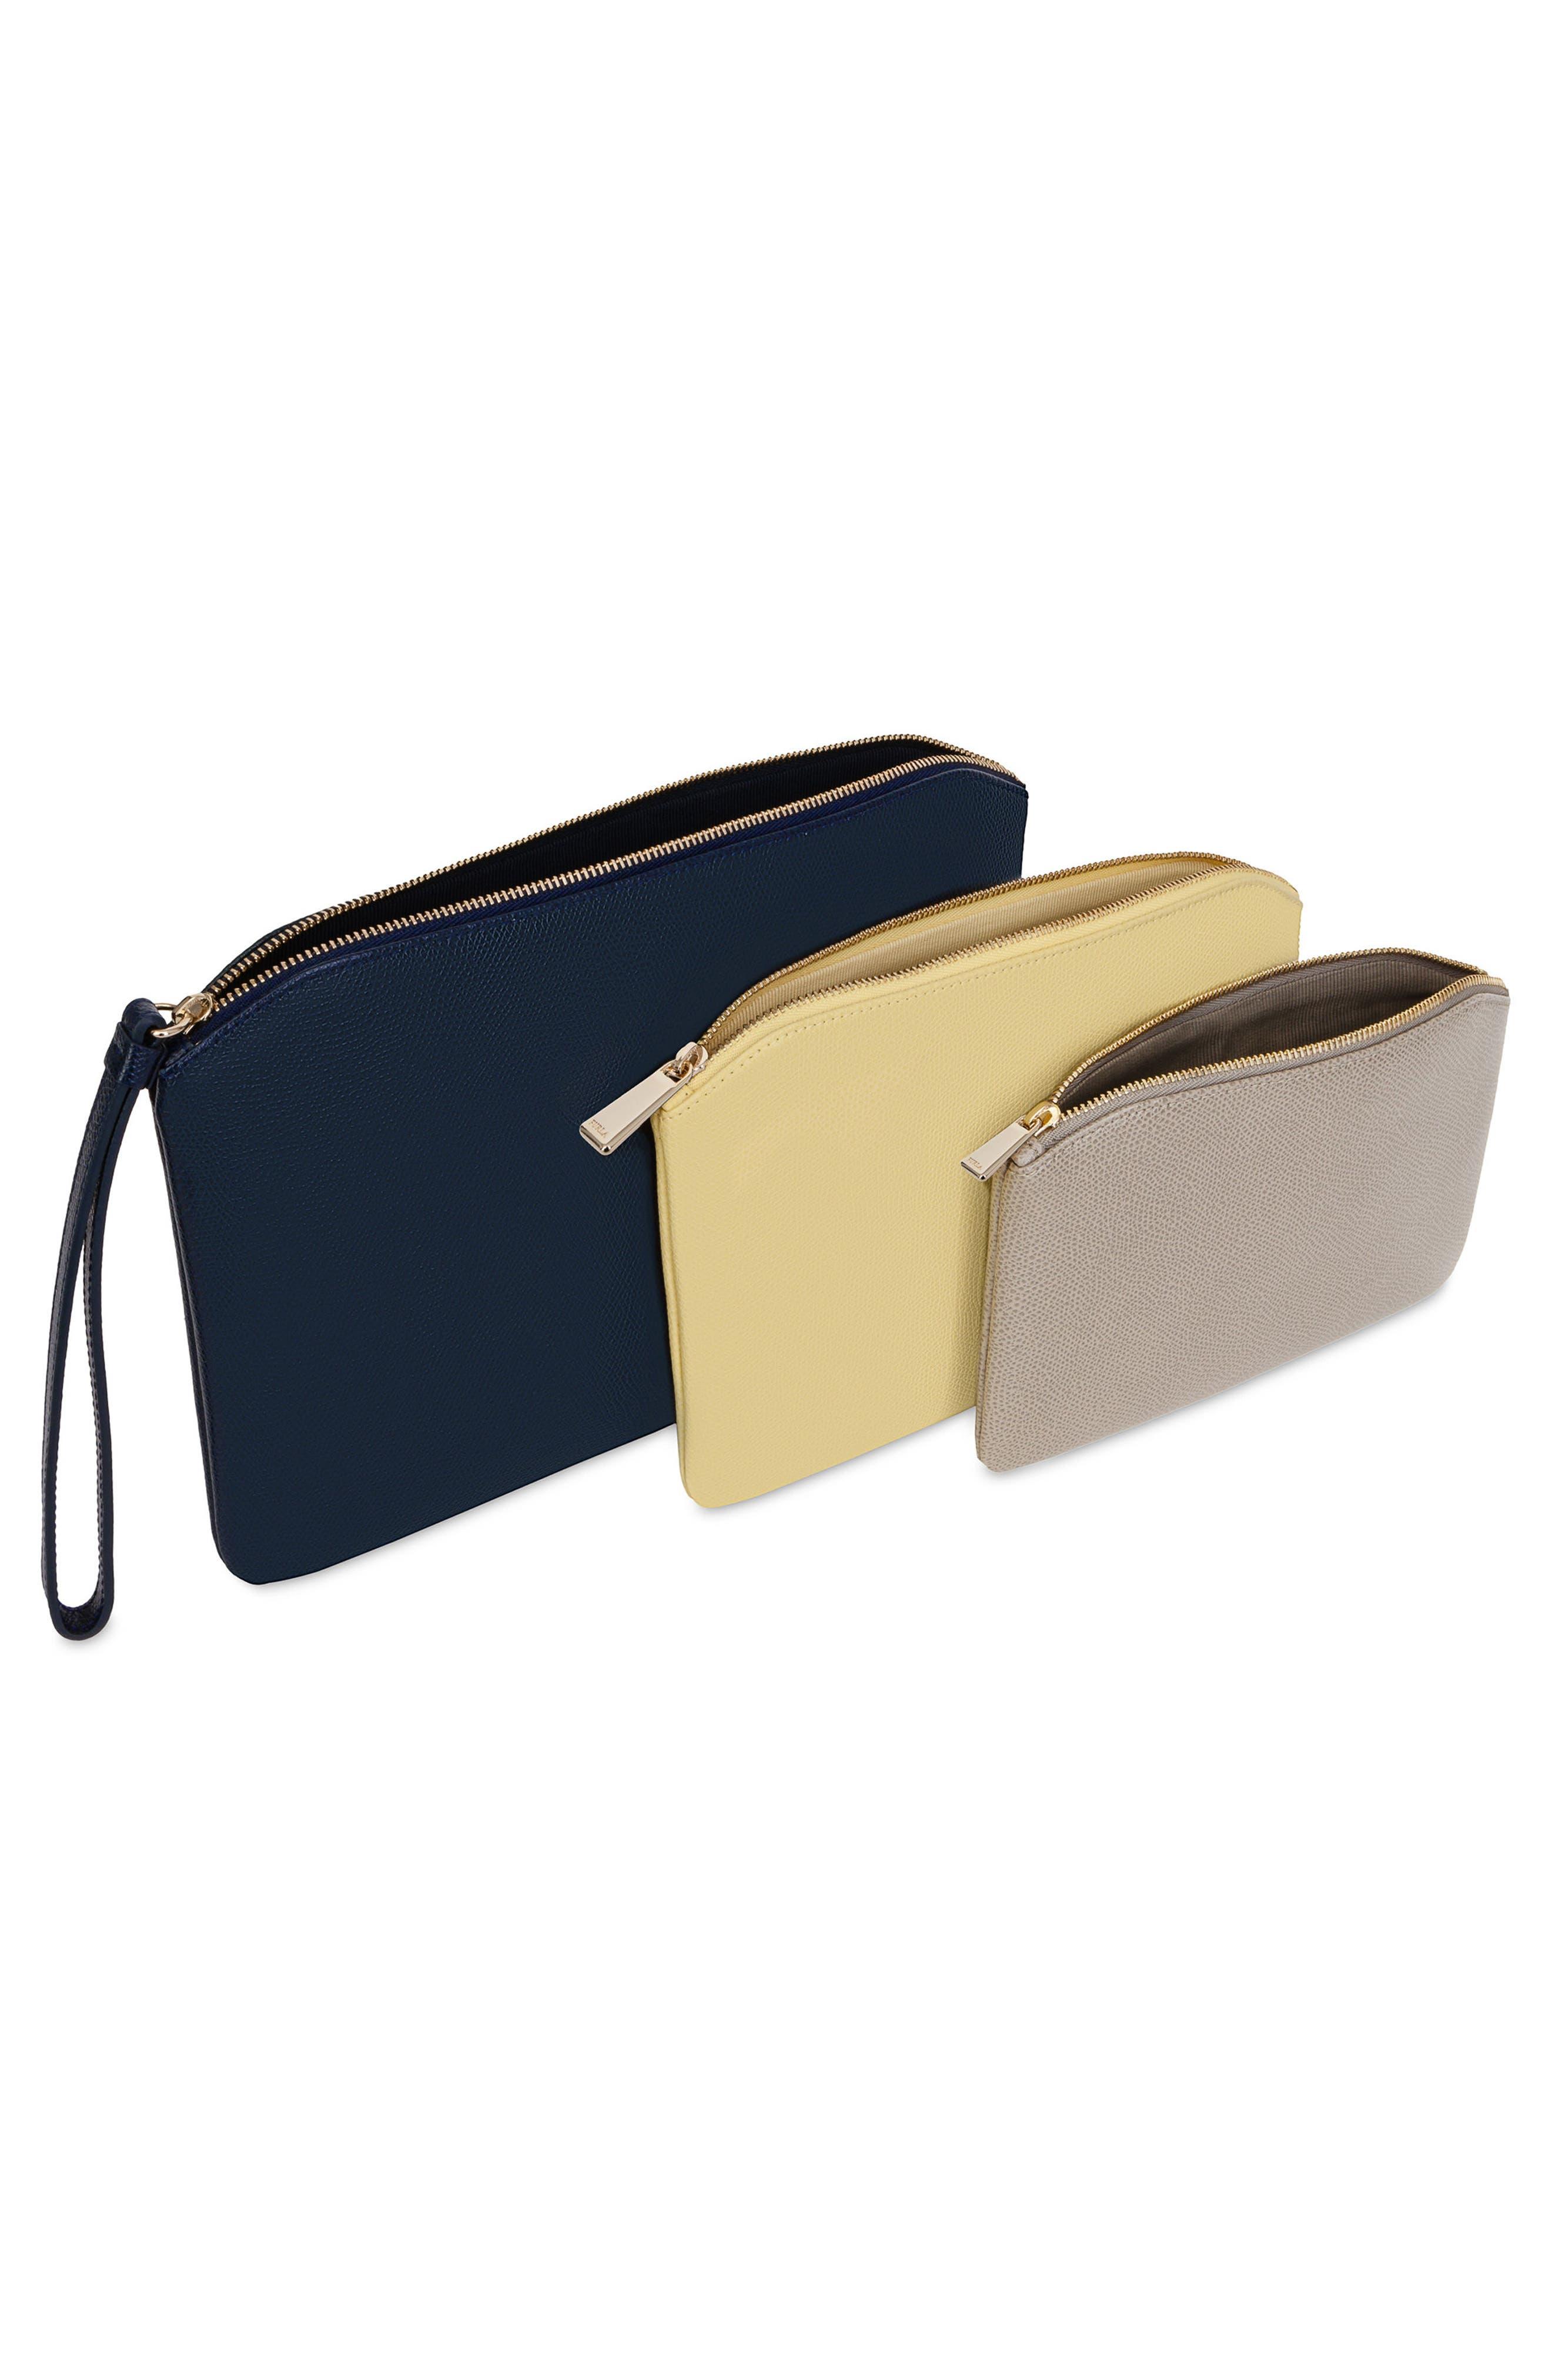 Venere Set of 3 Leather Cosmetic Bags,                             Alternate thumbnail 2, color,                             Blu/ Cedro/ Sabbia